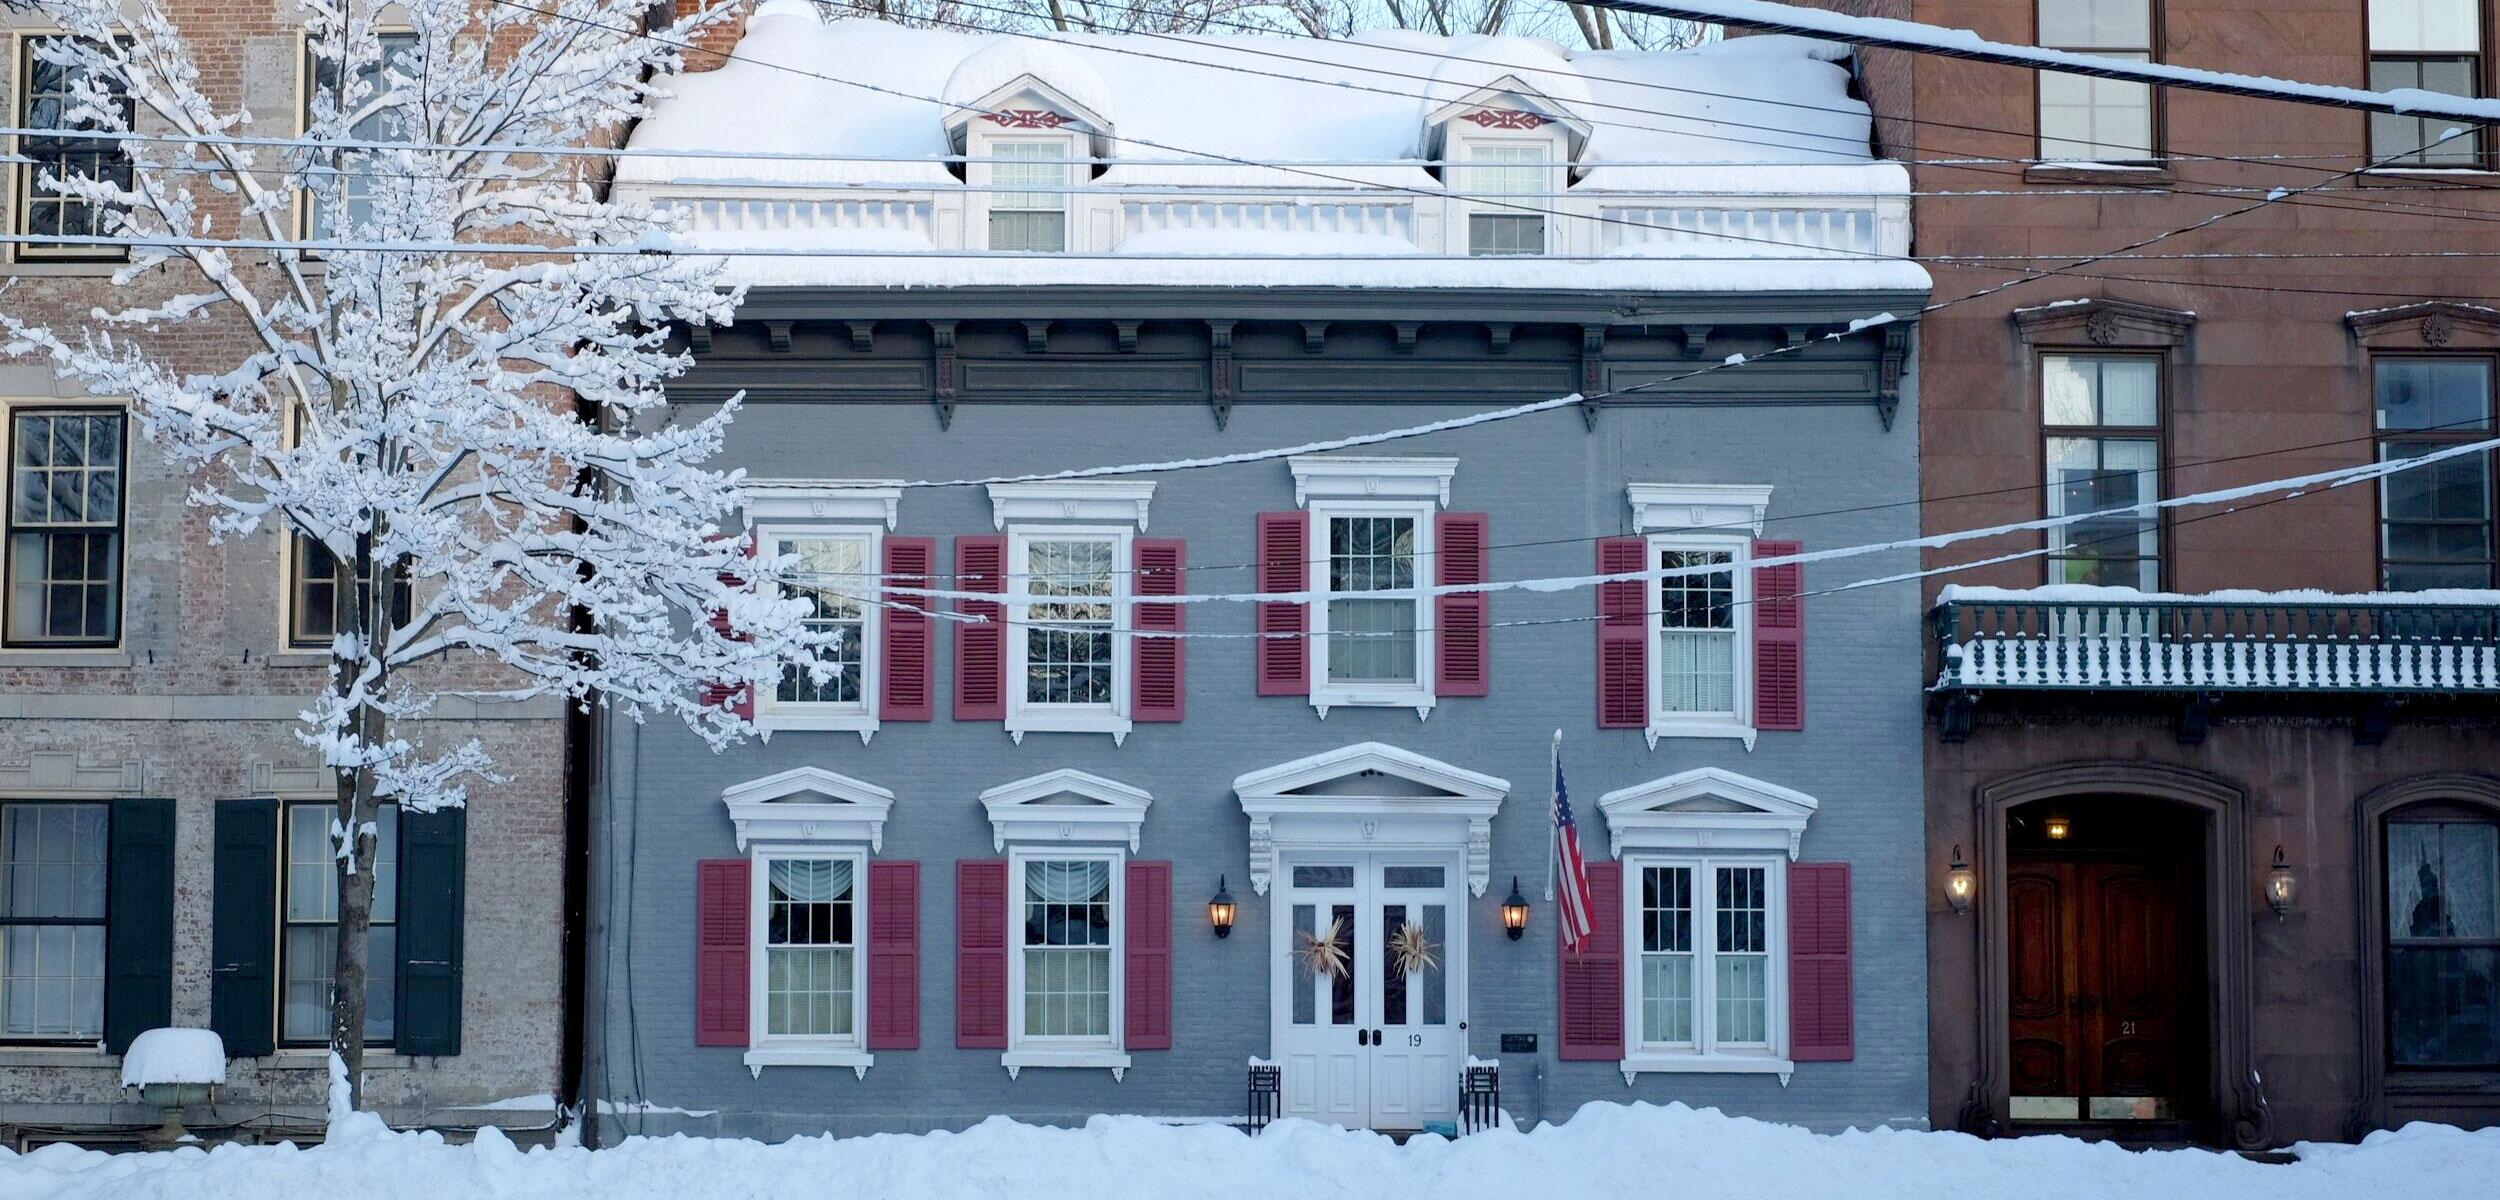 snowy blue brick building stockade